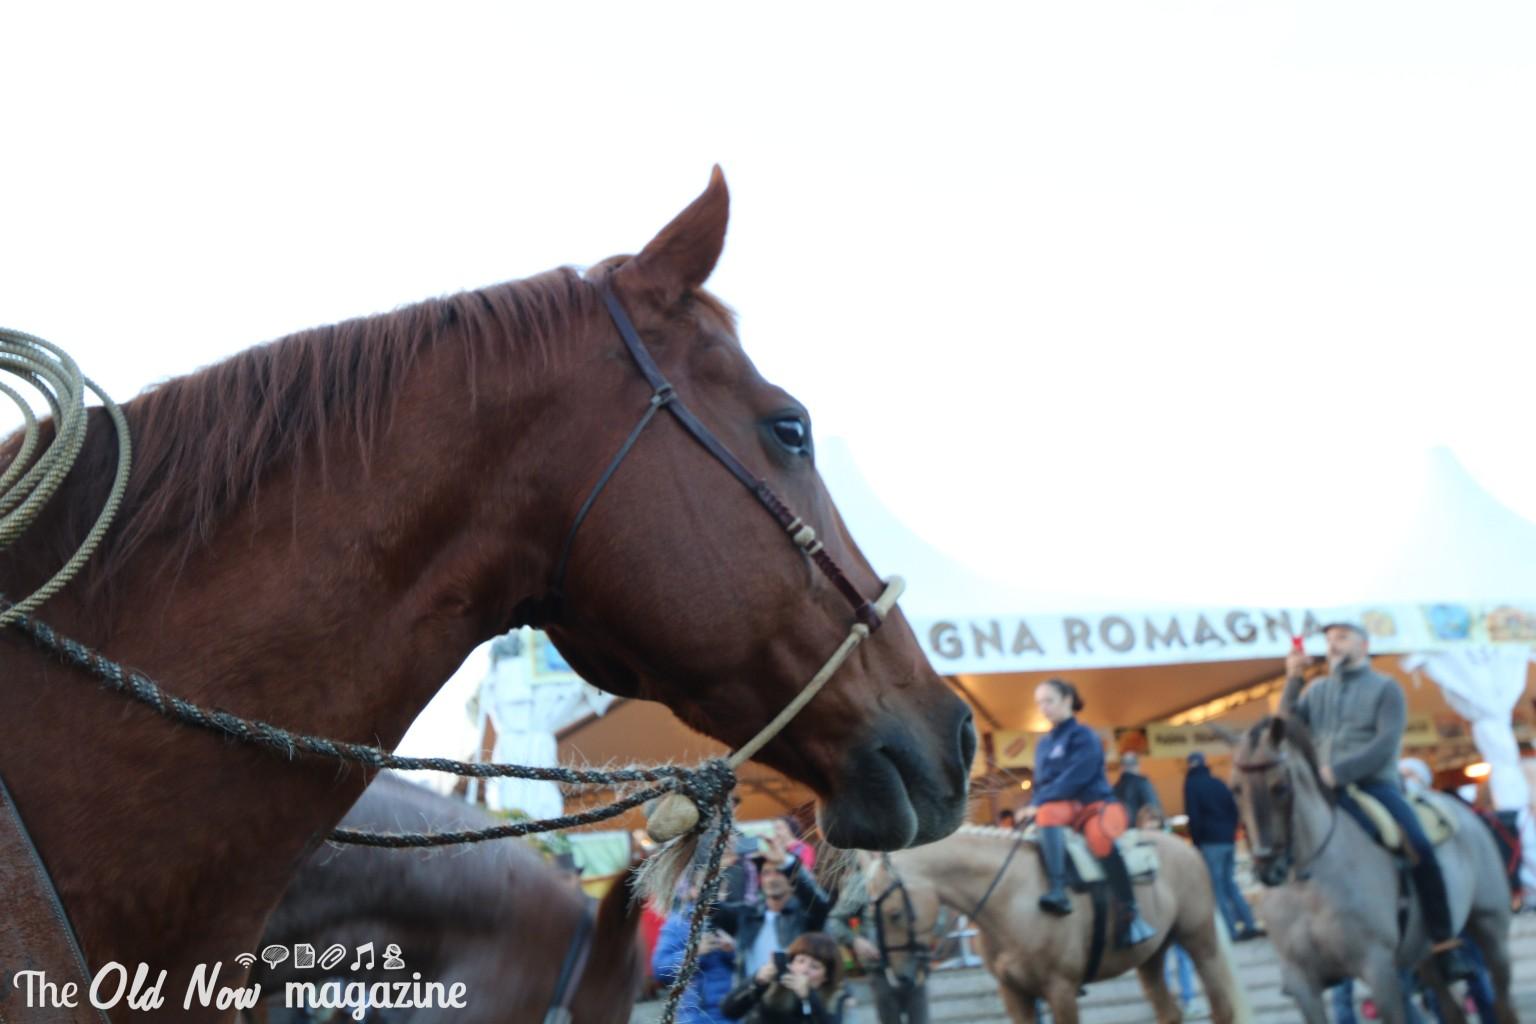 FIERA CAVALLI 2014 VERONA LONGINES THEOLDNOW (600)